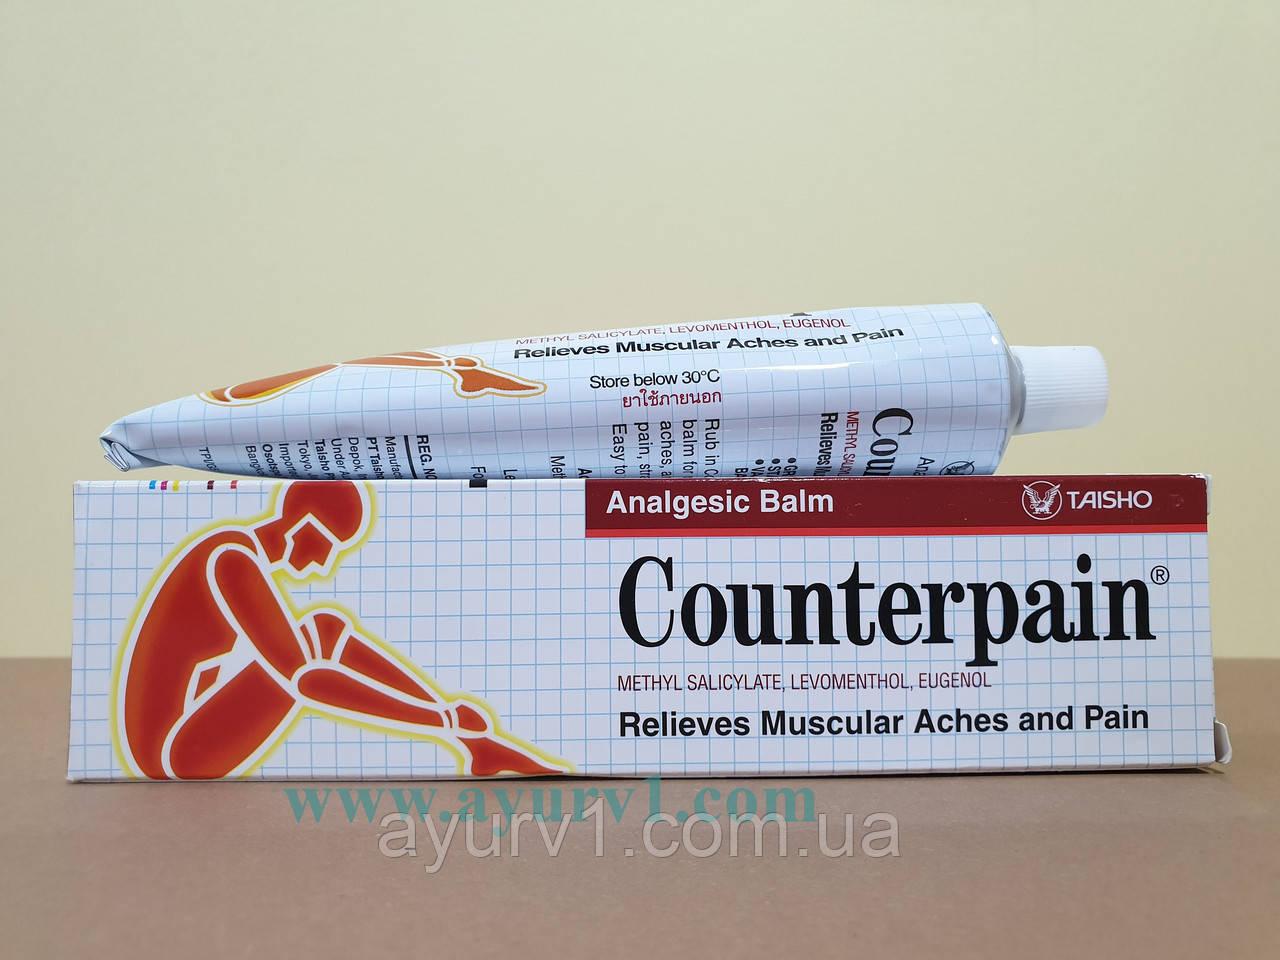 Мазь Counterpain в красной упаковке  Counterpain Таиланд  120 г.